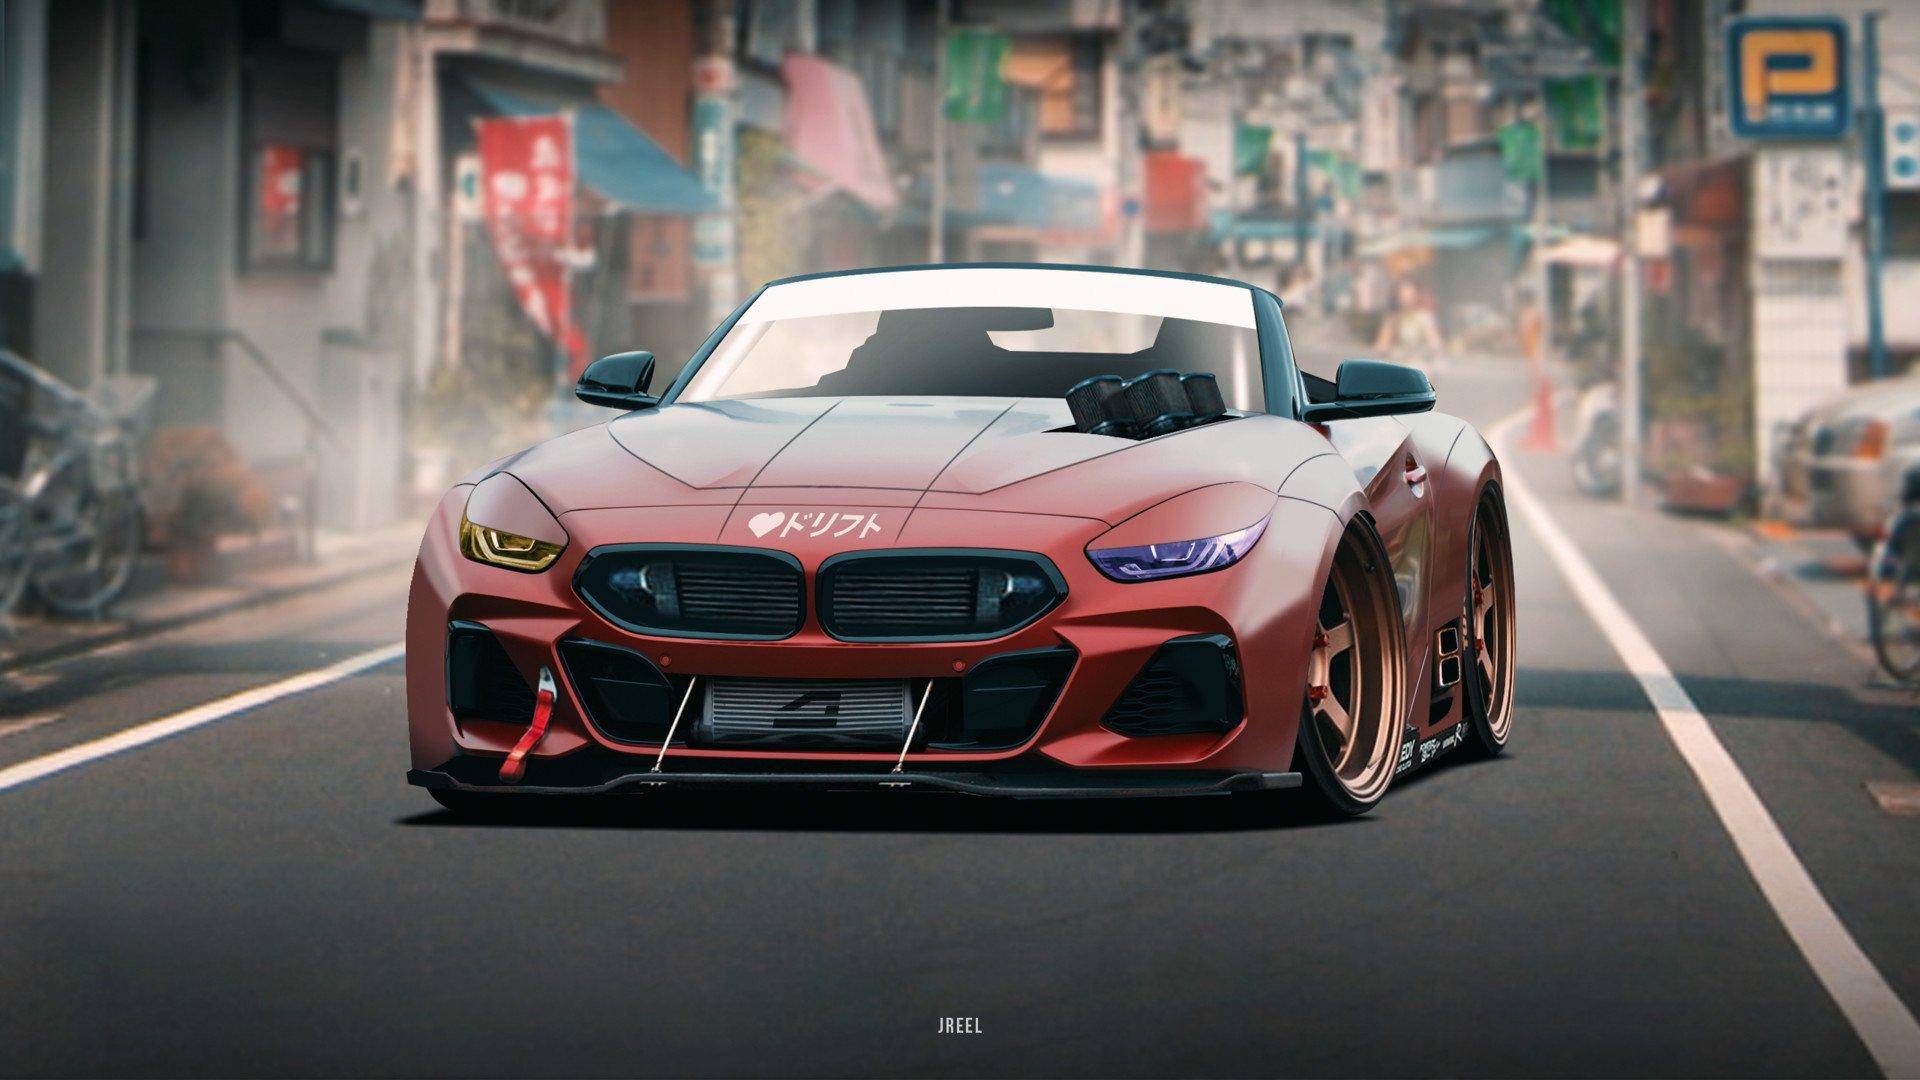 BMW Z4 HD Wallpaper | Background Image | 1920x1080 | ID ...